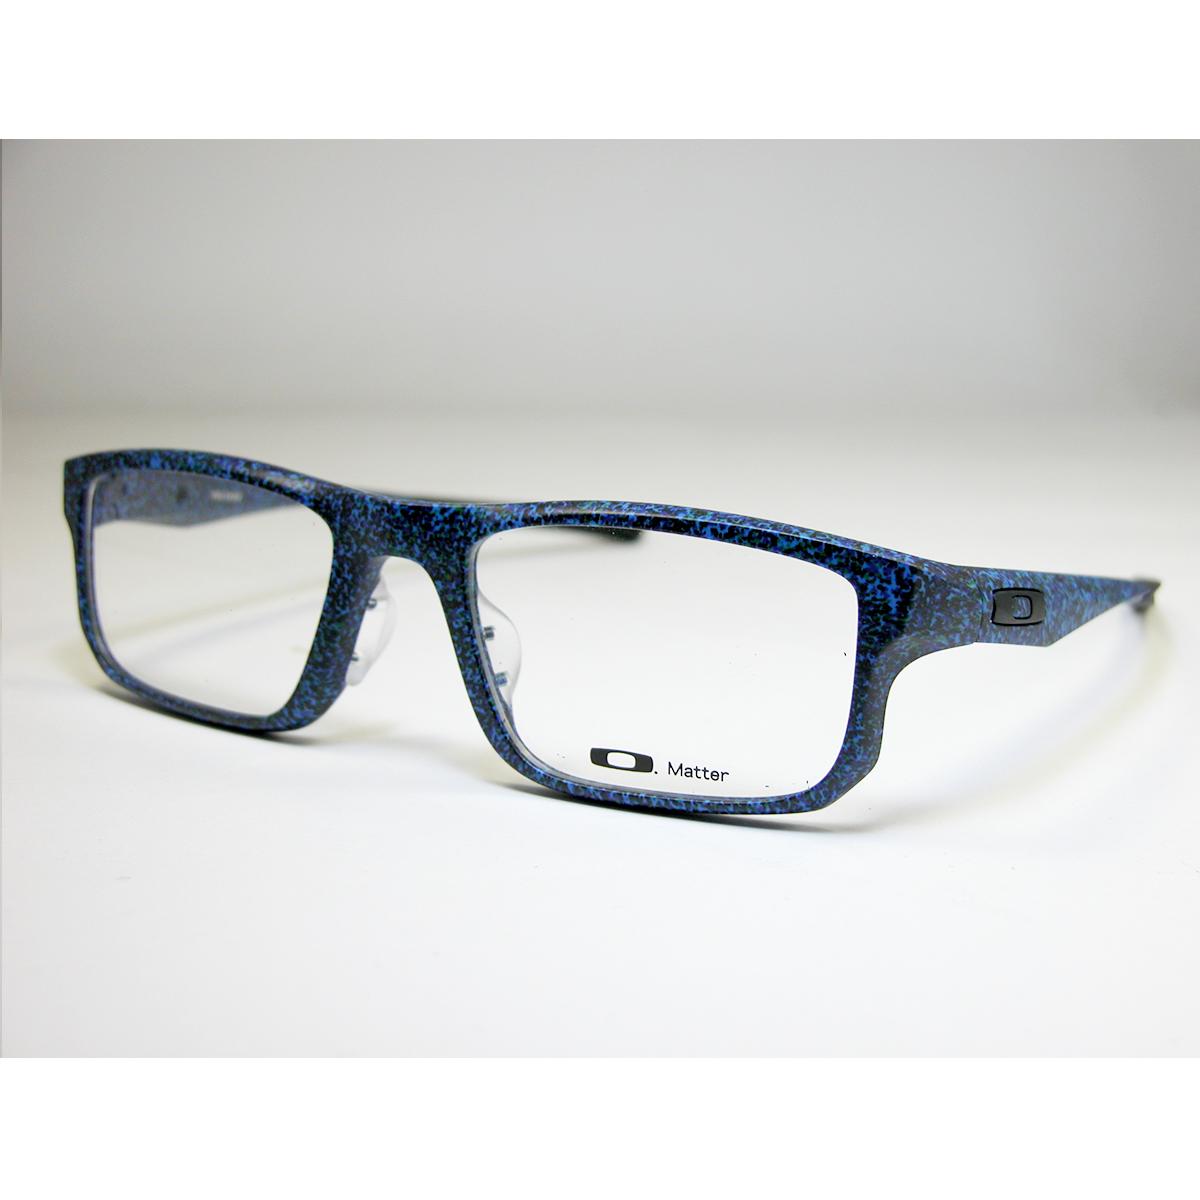 OAKLEYオークリーVOLTAGEOX-8066-0453 メンズ メガネ サングラス【ありがとう】【店頭受取対応商品】